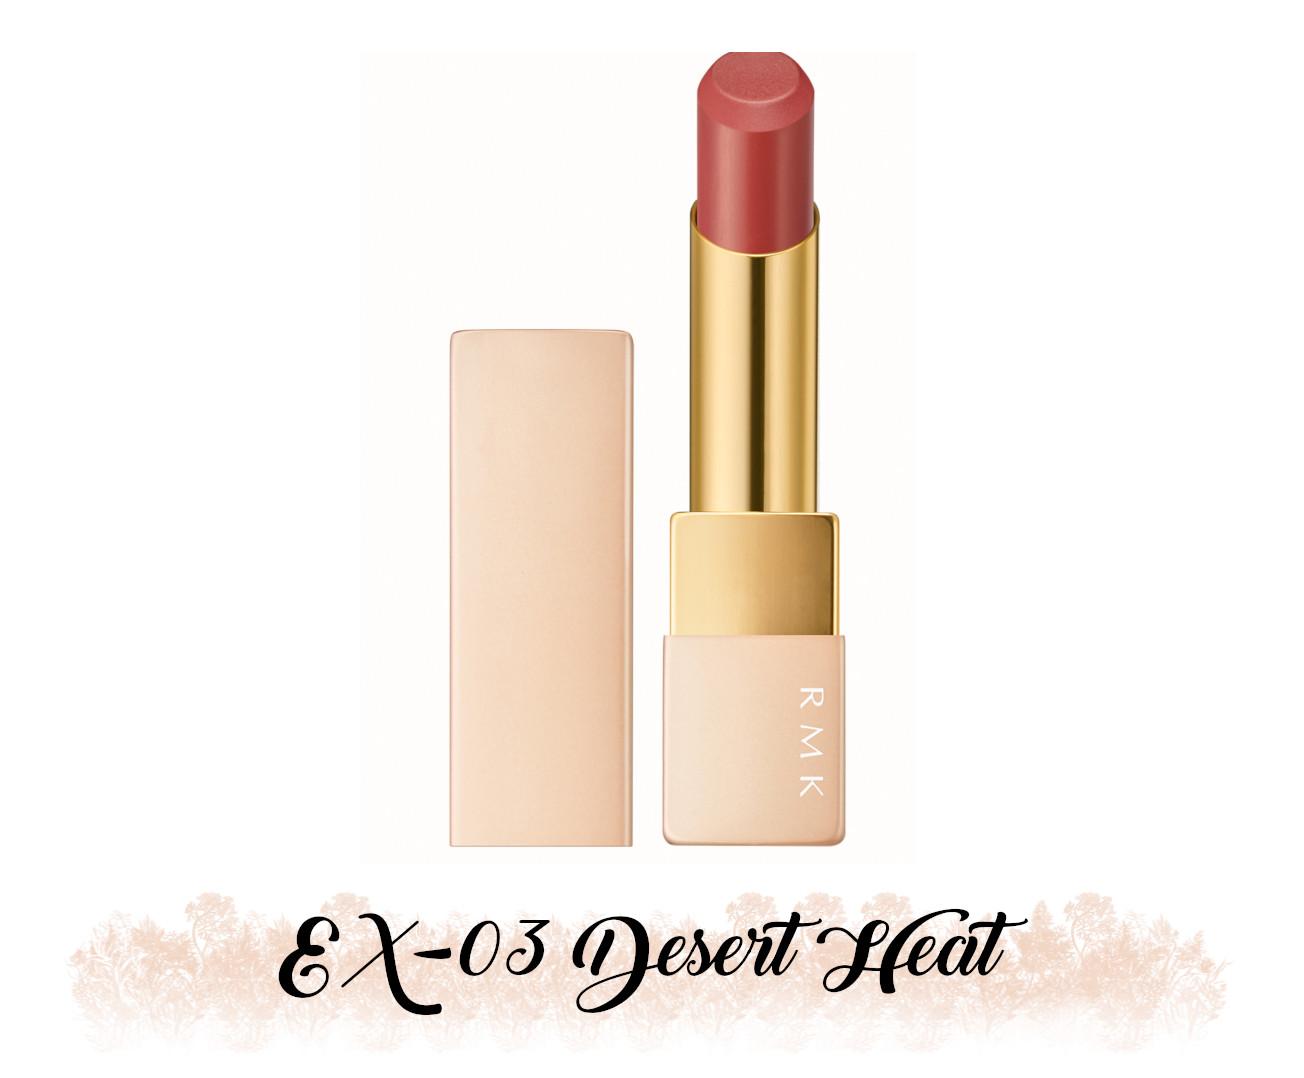 RMK Fall 2021 Collection Rosewood Daydream Lipstick Comfort Airy Shine EX-03 Desert Heat